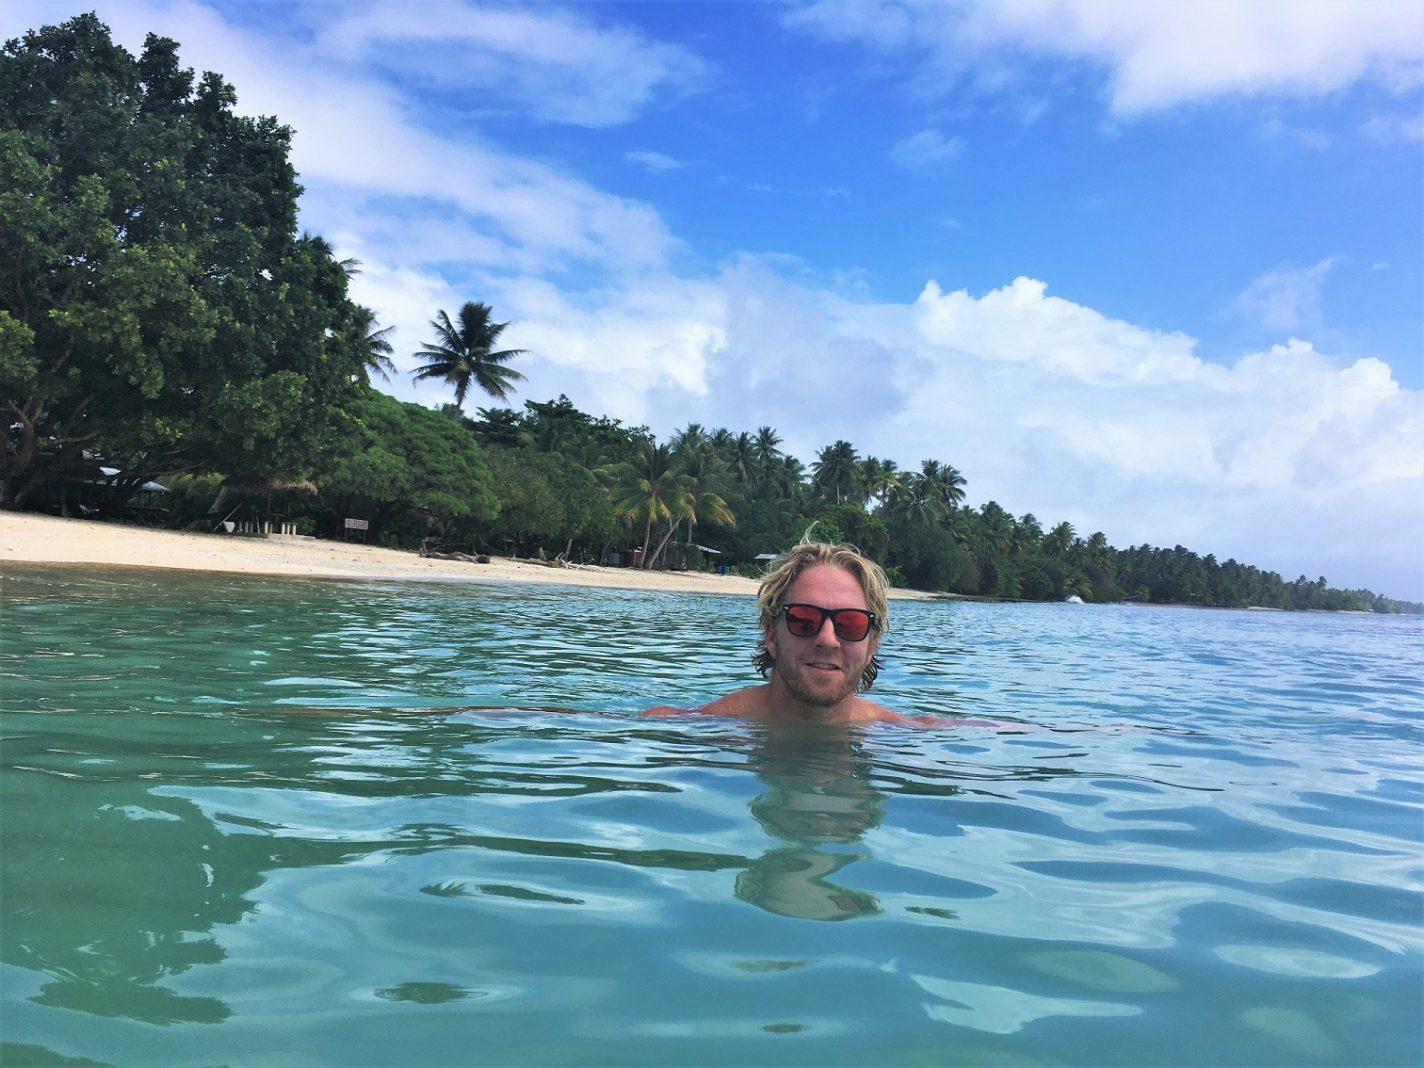 Middagje snorkelen en zwemmen - Marshall islands